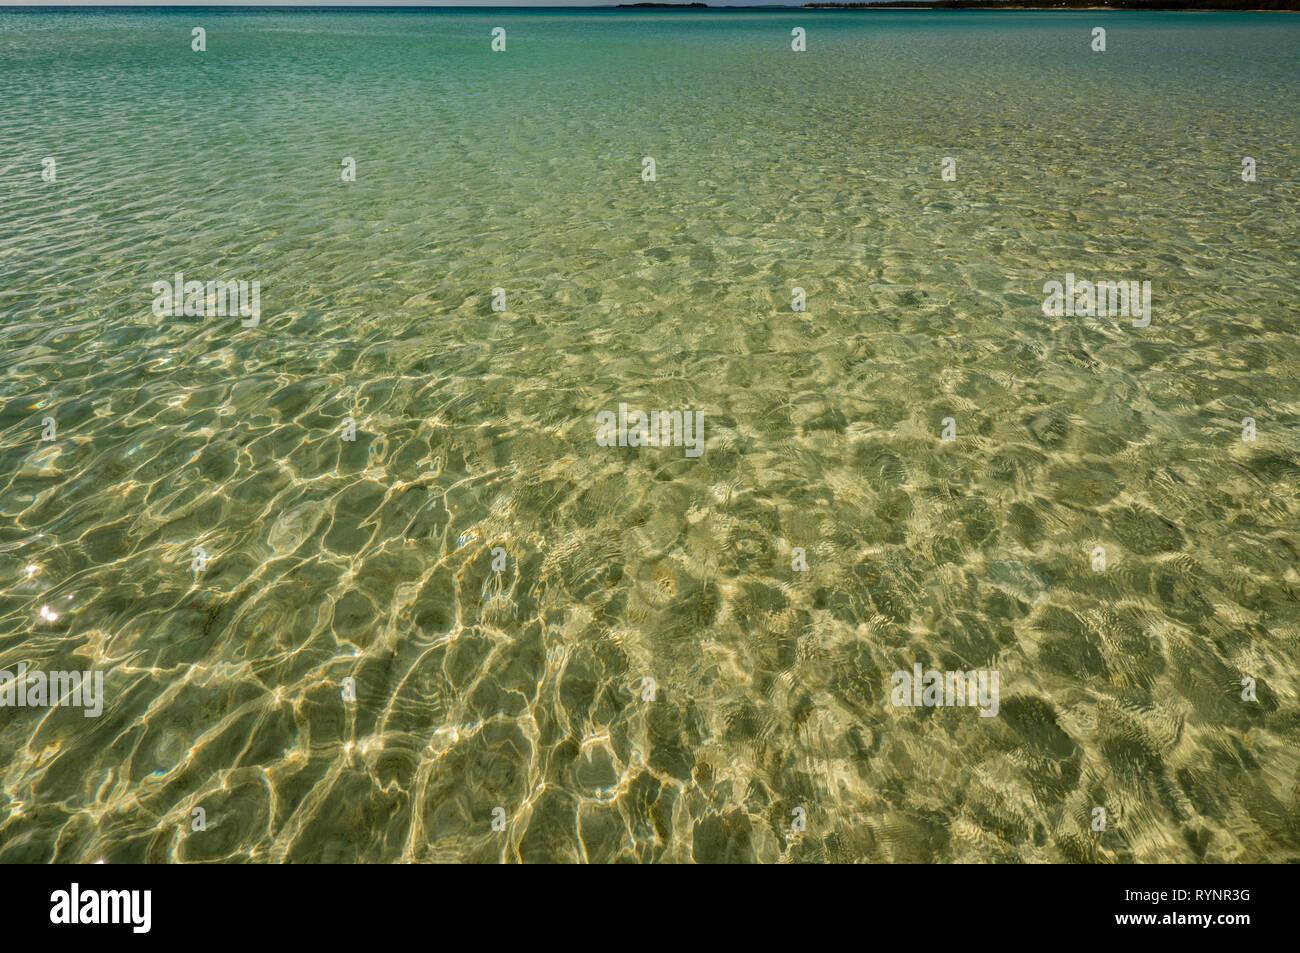 Amazing Beautiful Caribbean Sea,  at Cocodimama Charming Resort, Governors Harbour, Eleuthera, The Bahamas, The Caribbean. - Stock Image